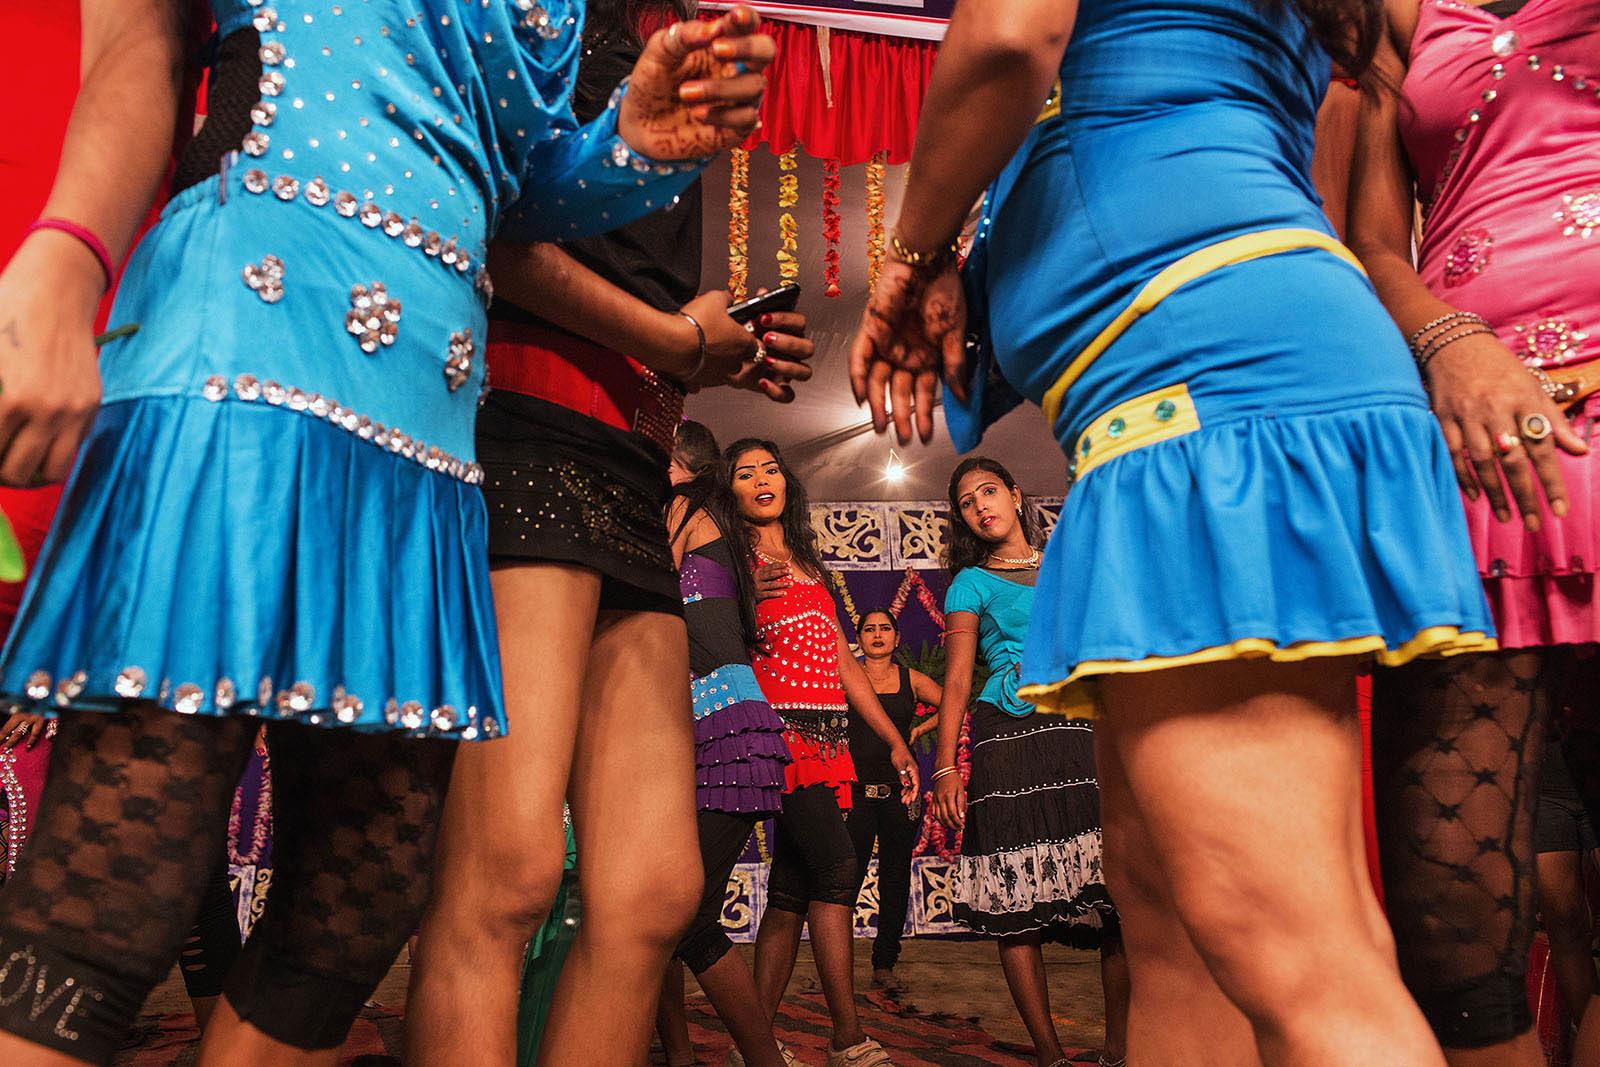 india_bihar_sonpur_sonepur_mela_dance_show_dancing_theatre_girls_dancers-1600x1067.jpg